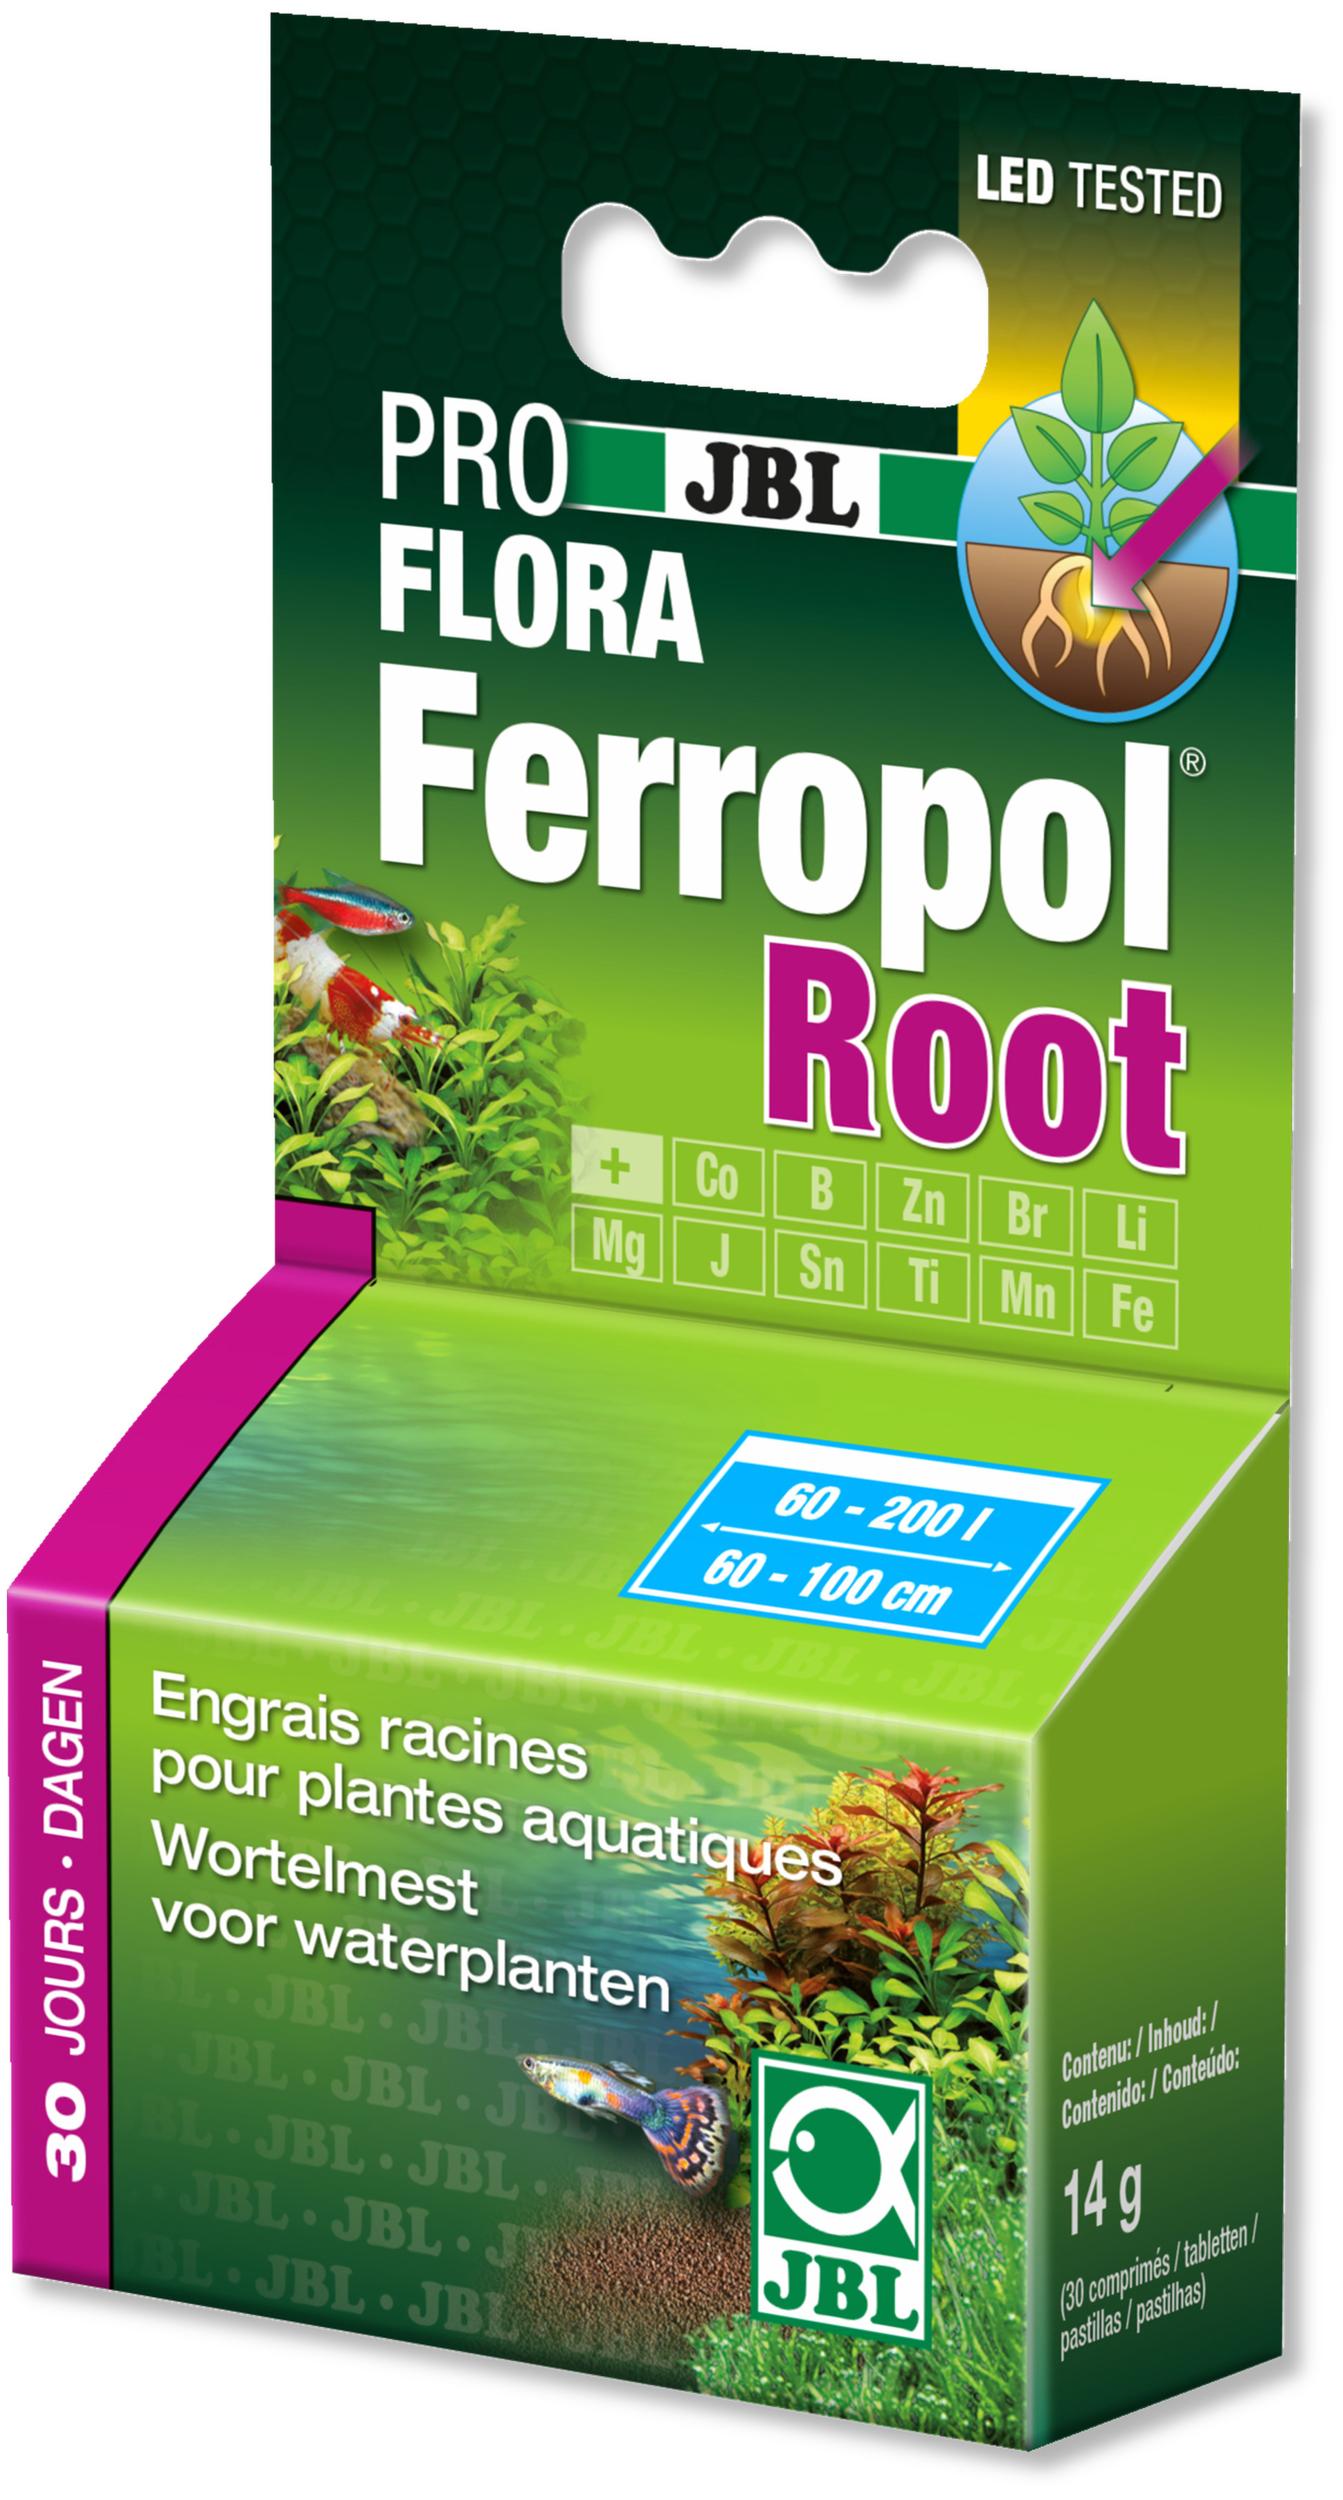 JBL Ferropol Root 30 comprimés d\'engrais complet pour plantes d\'aquarium